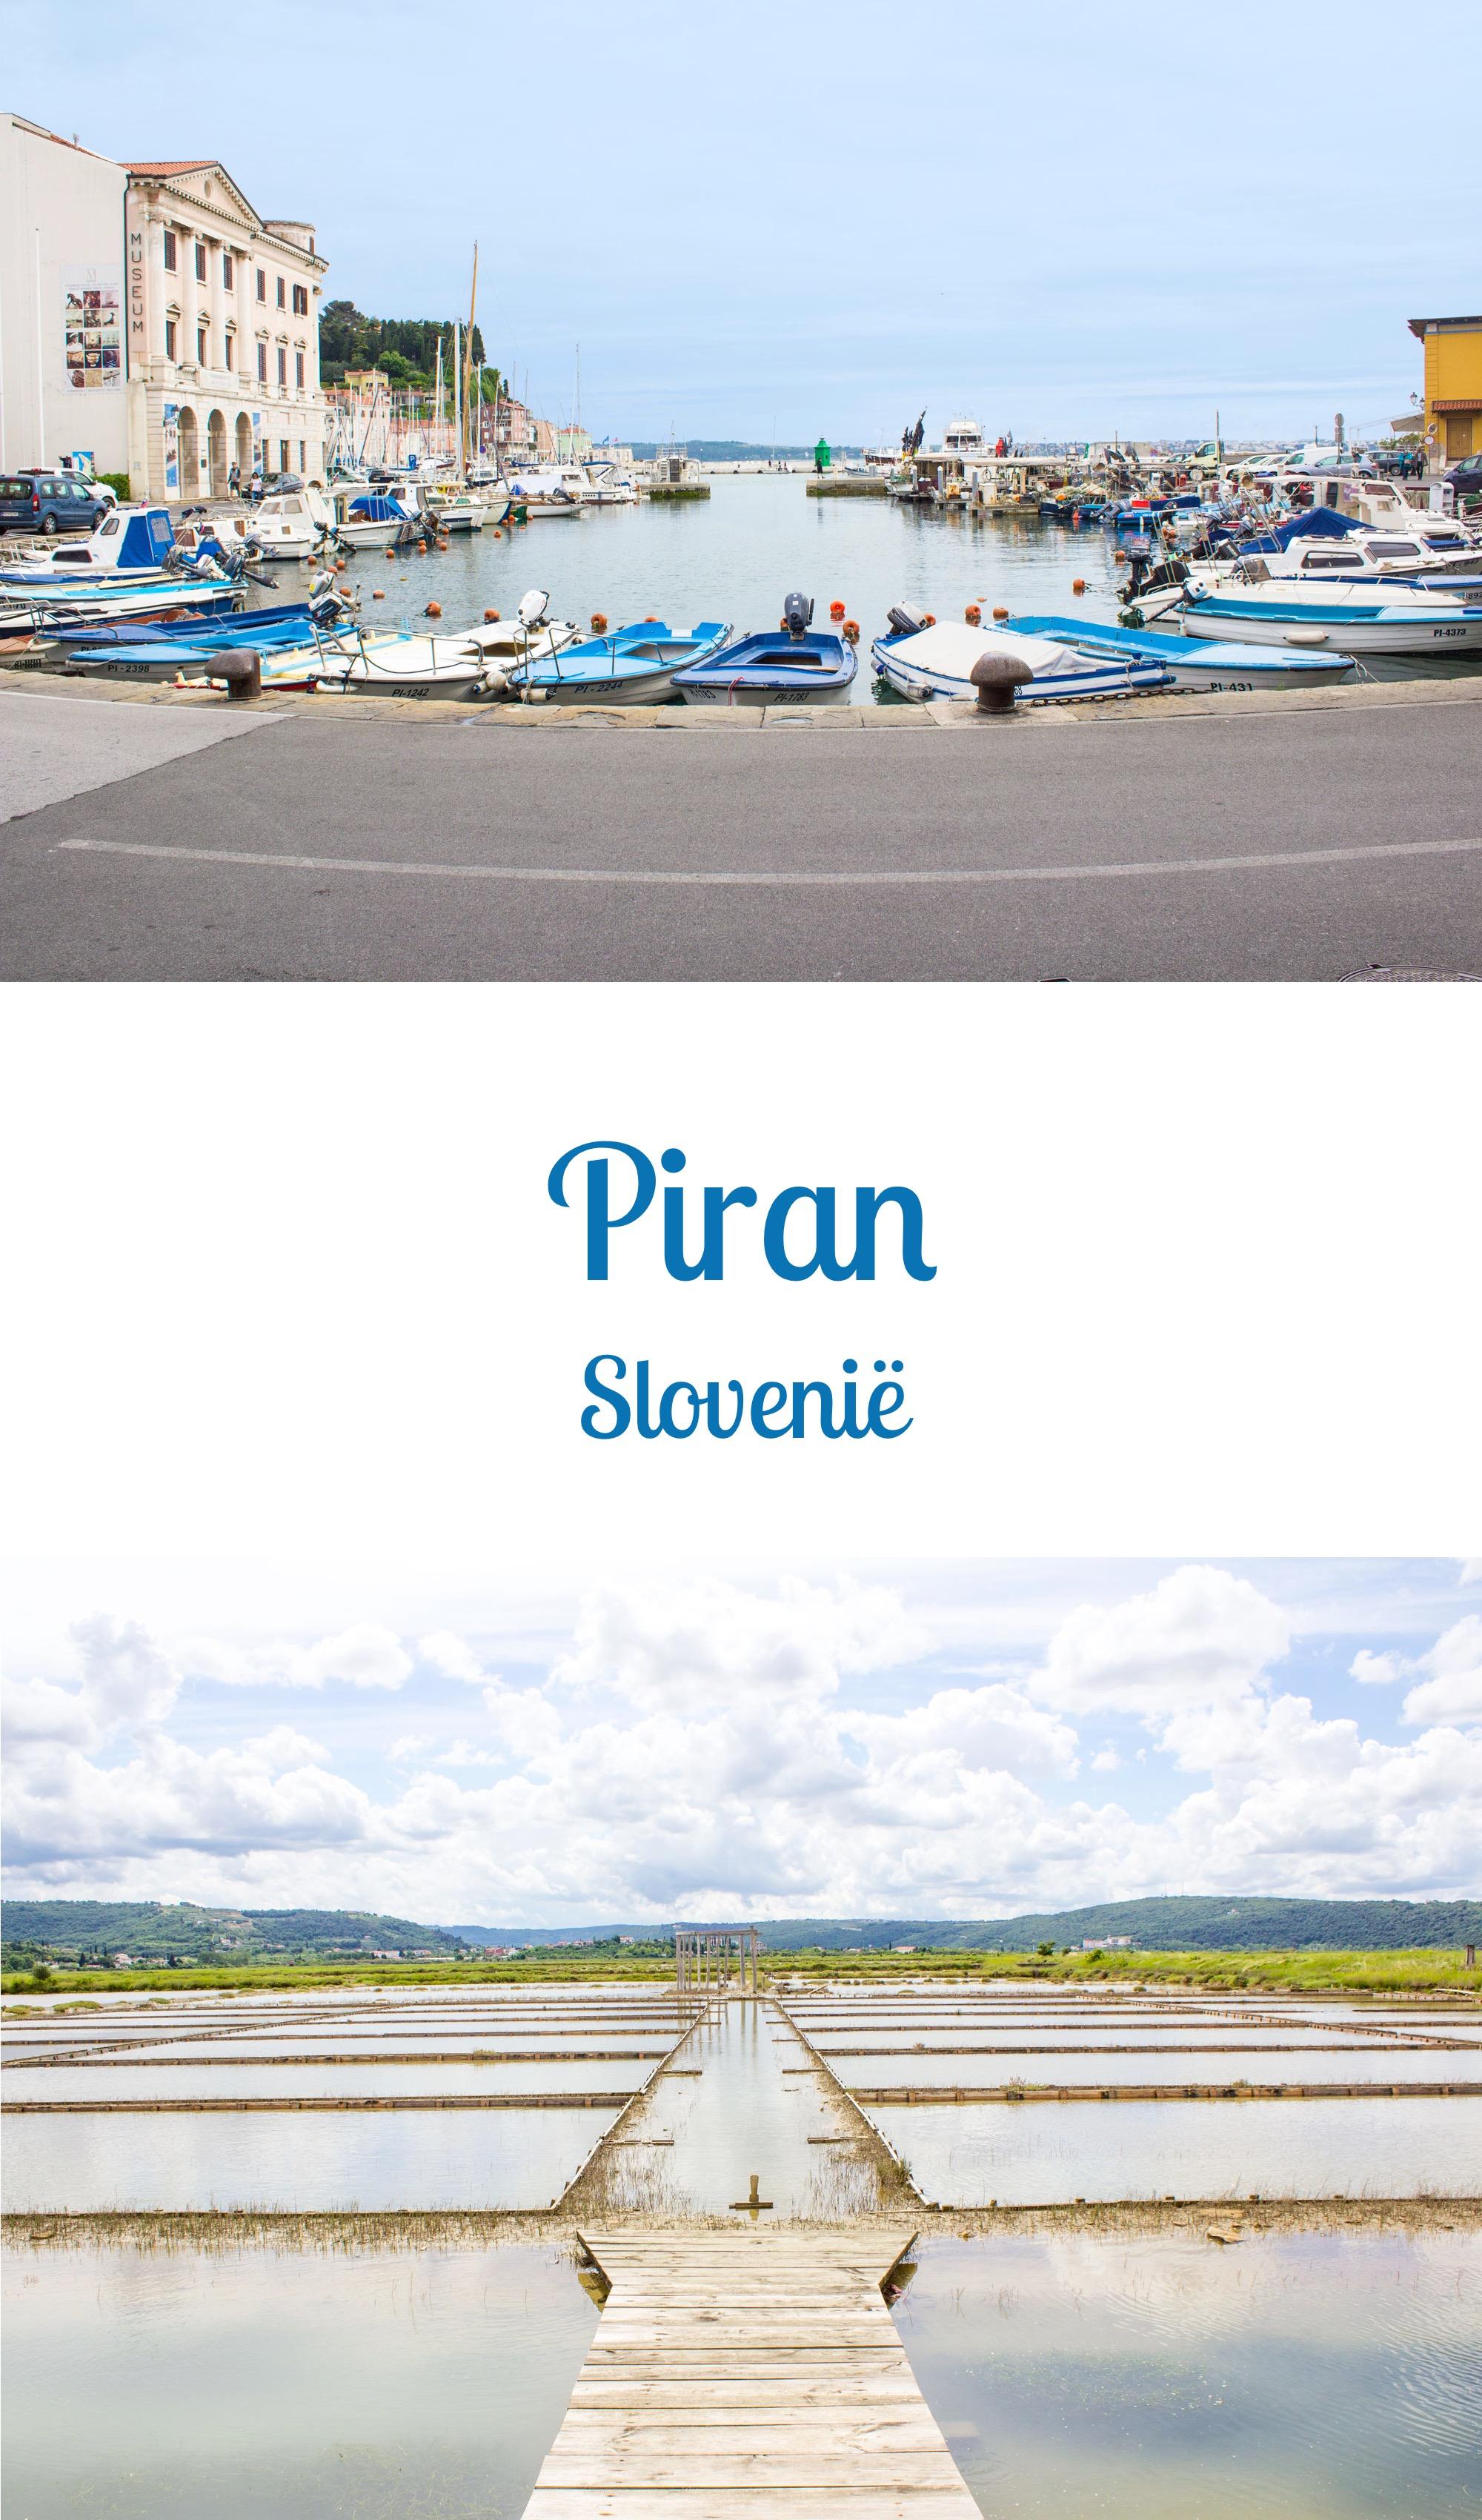 Slovenië - De kustplaats Piran